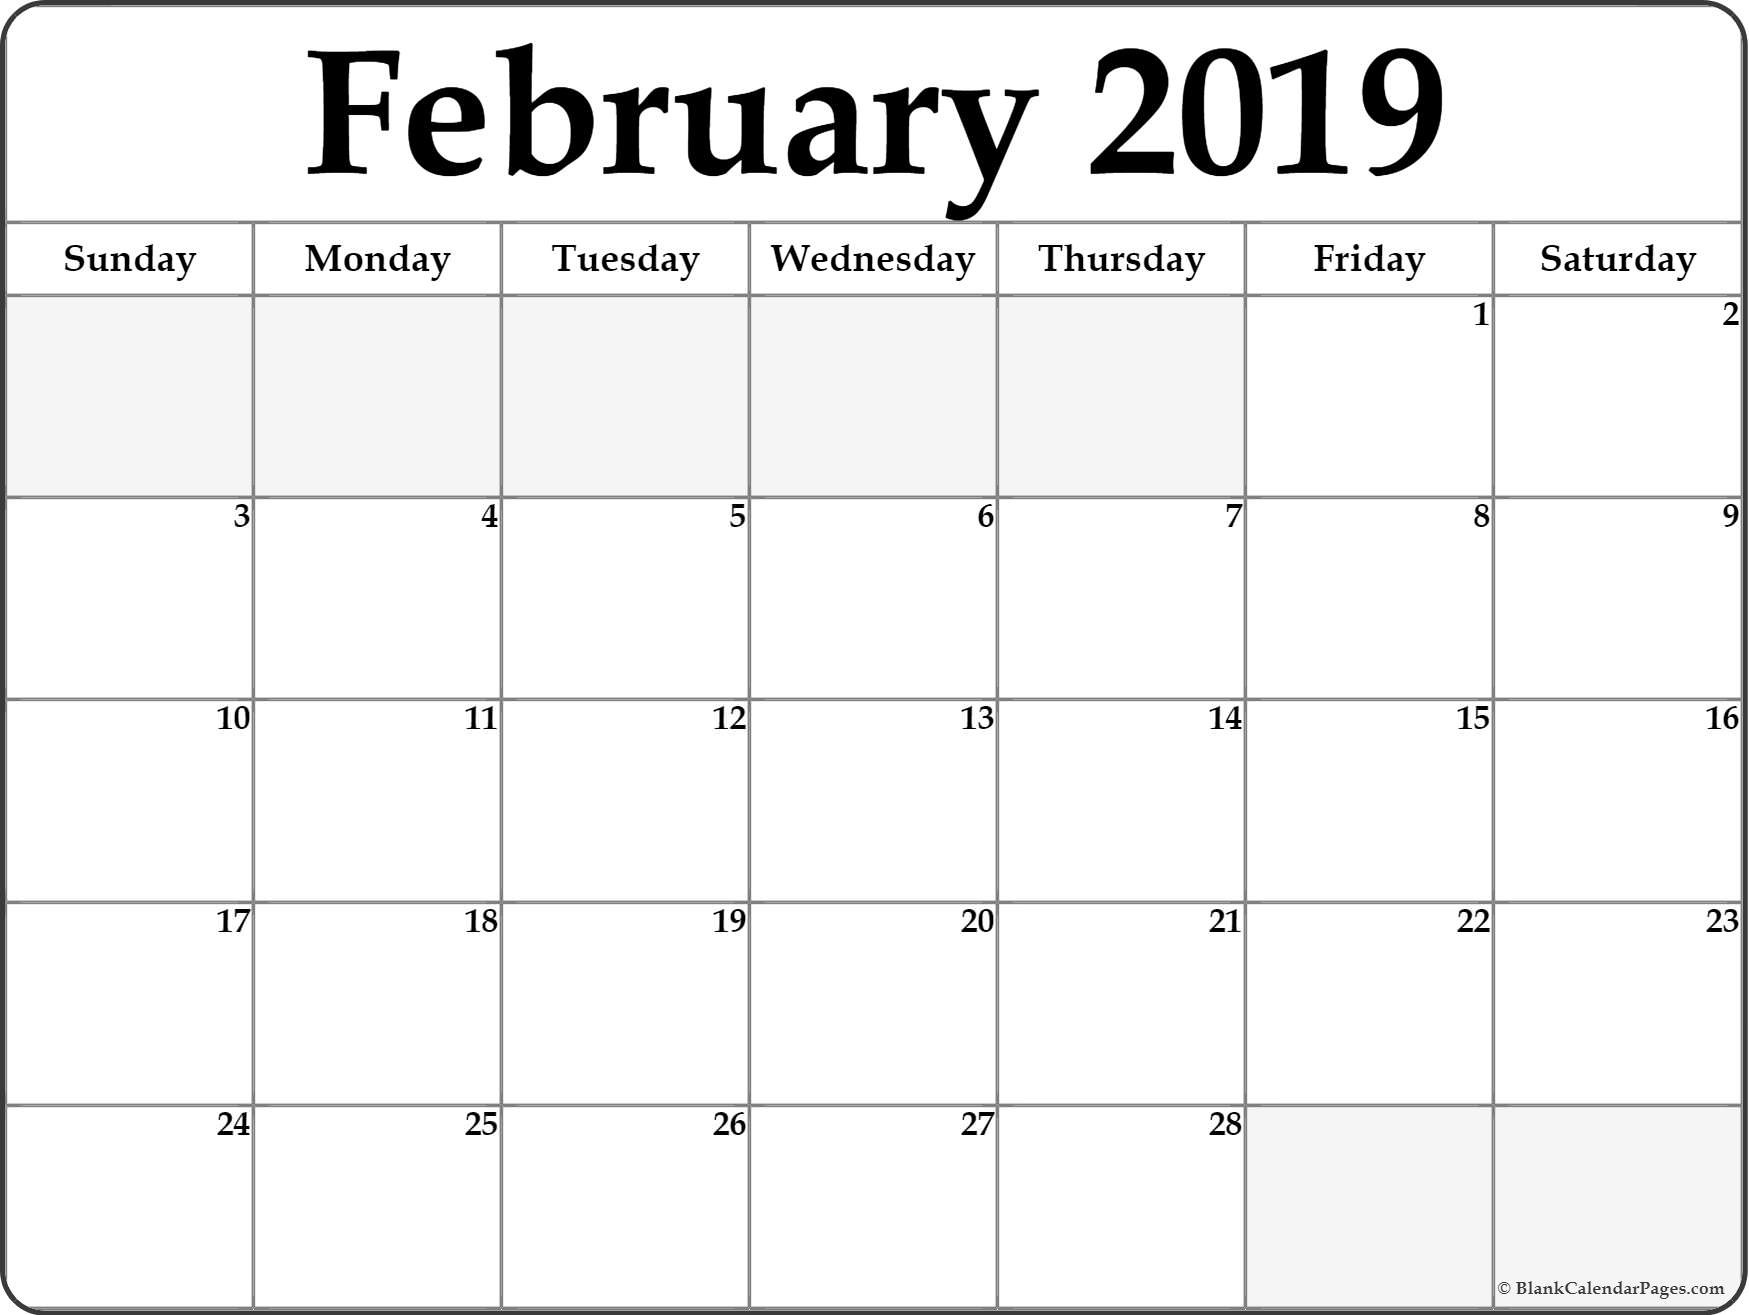 Free Printable February 2019 Calendar 51 Free February 2019 Printable Calendar Templates Pdf